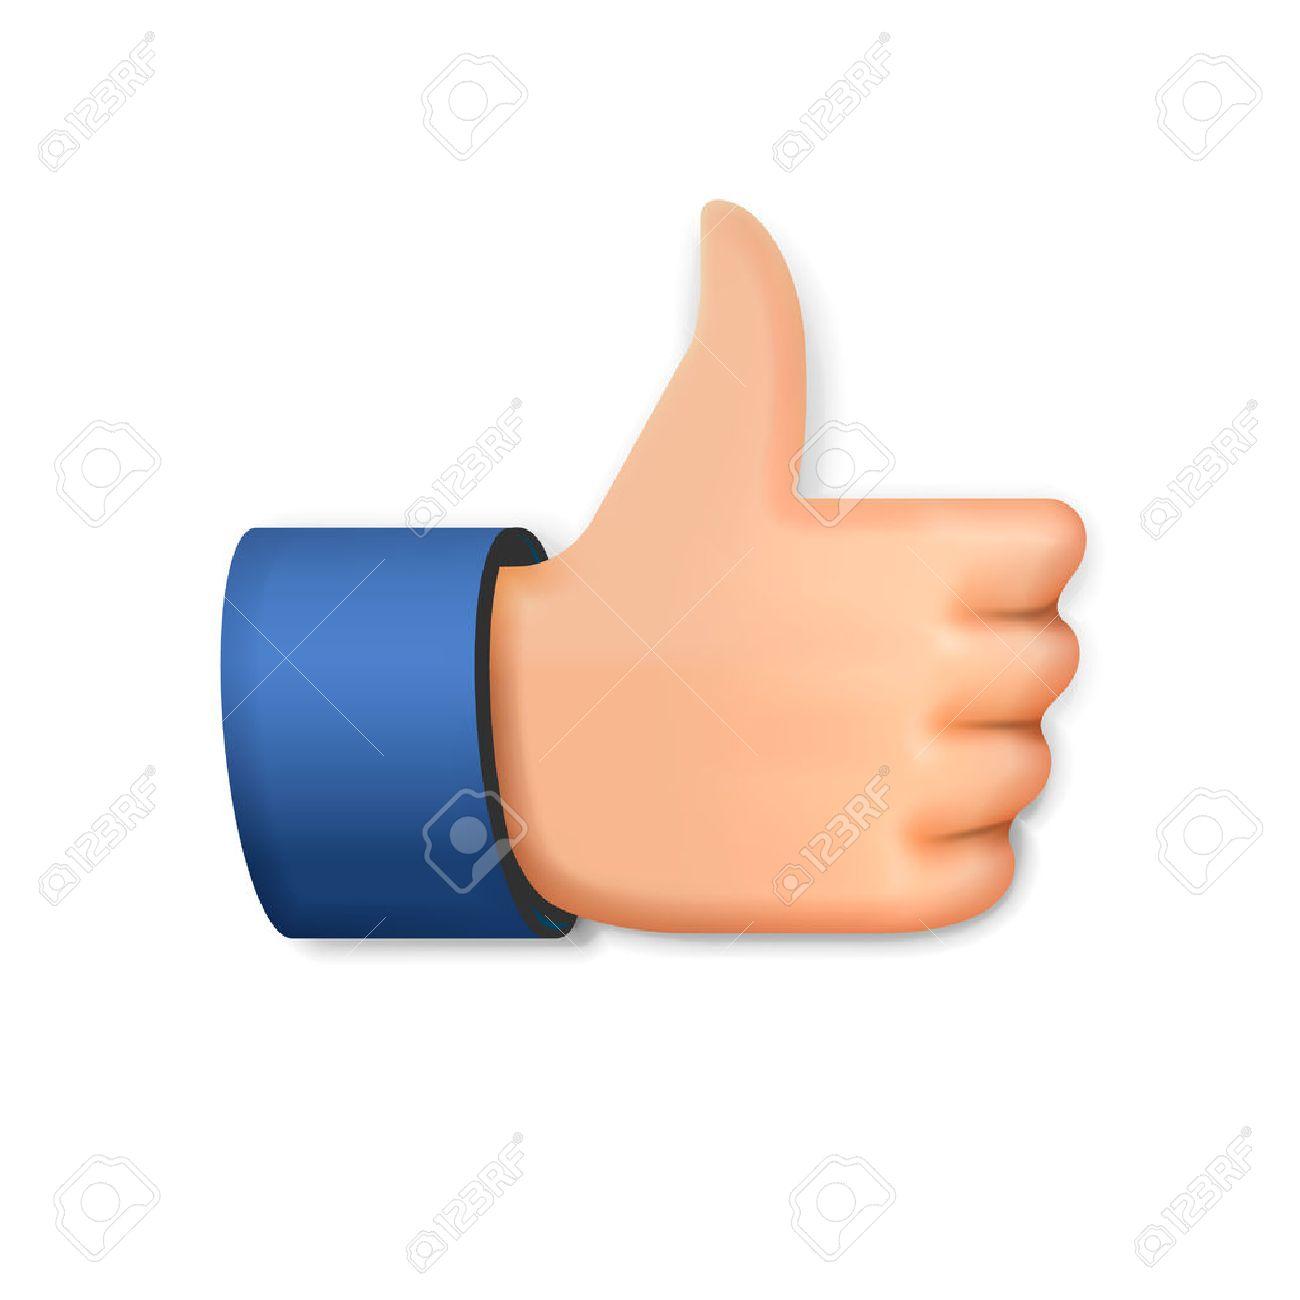 Like icon, emoji thumb up symbol, vector illustration. Standard-Bild - 53022850